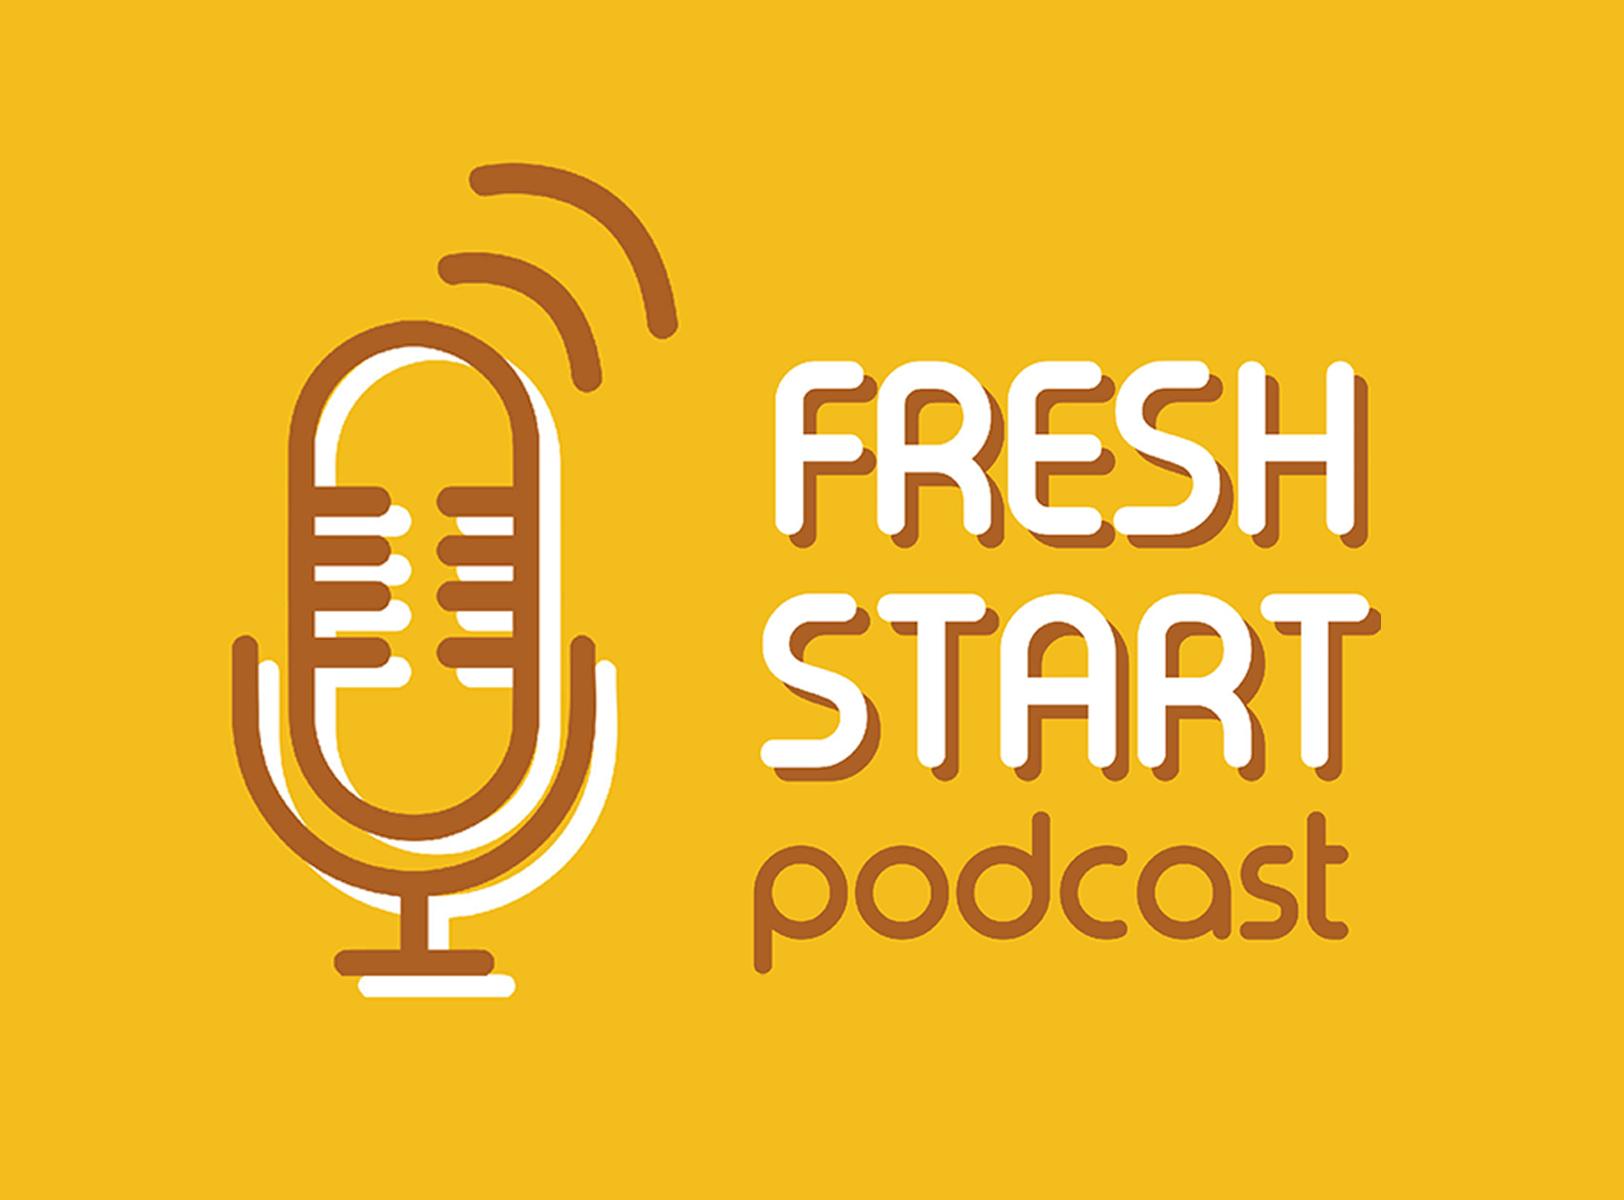 Fresh Start: Podcast News (4/30/2020 Thu.)